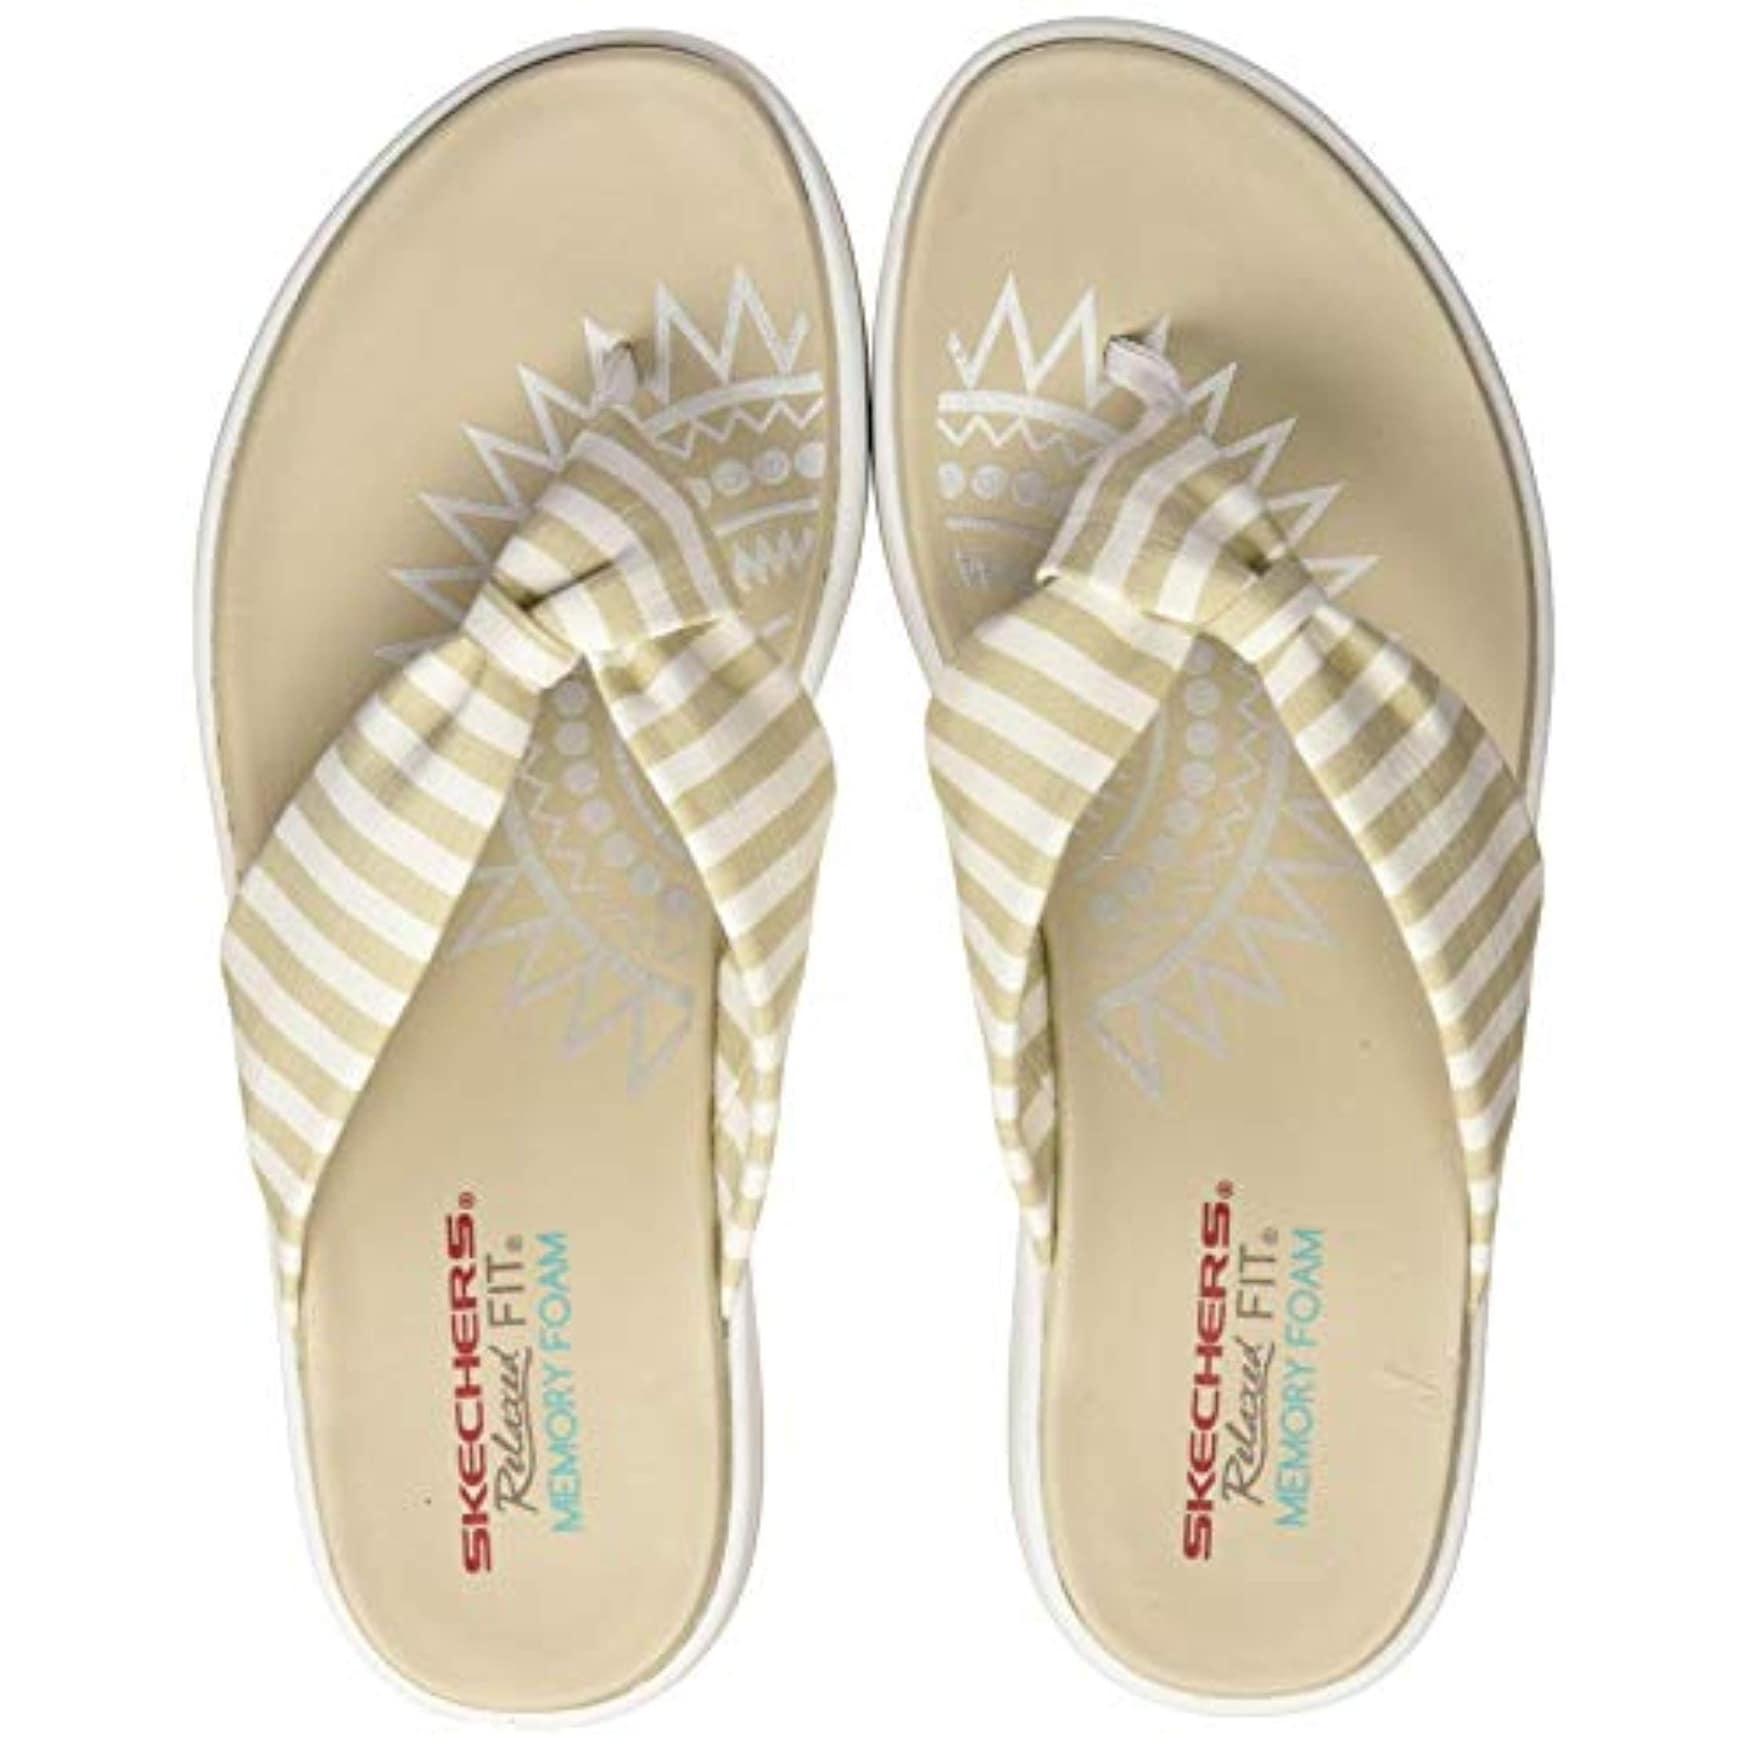 Tomate enemigo niebla tóxica  Skechers Relaxed Fit Upgrades Moon Bay Womens Flip Flops Natural 7 -  Overstock - 28658891